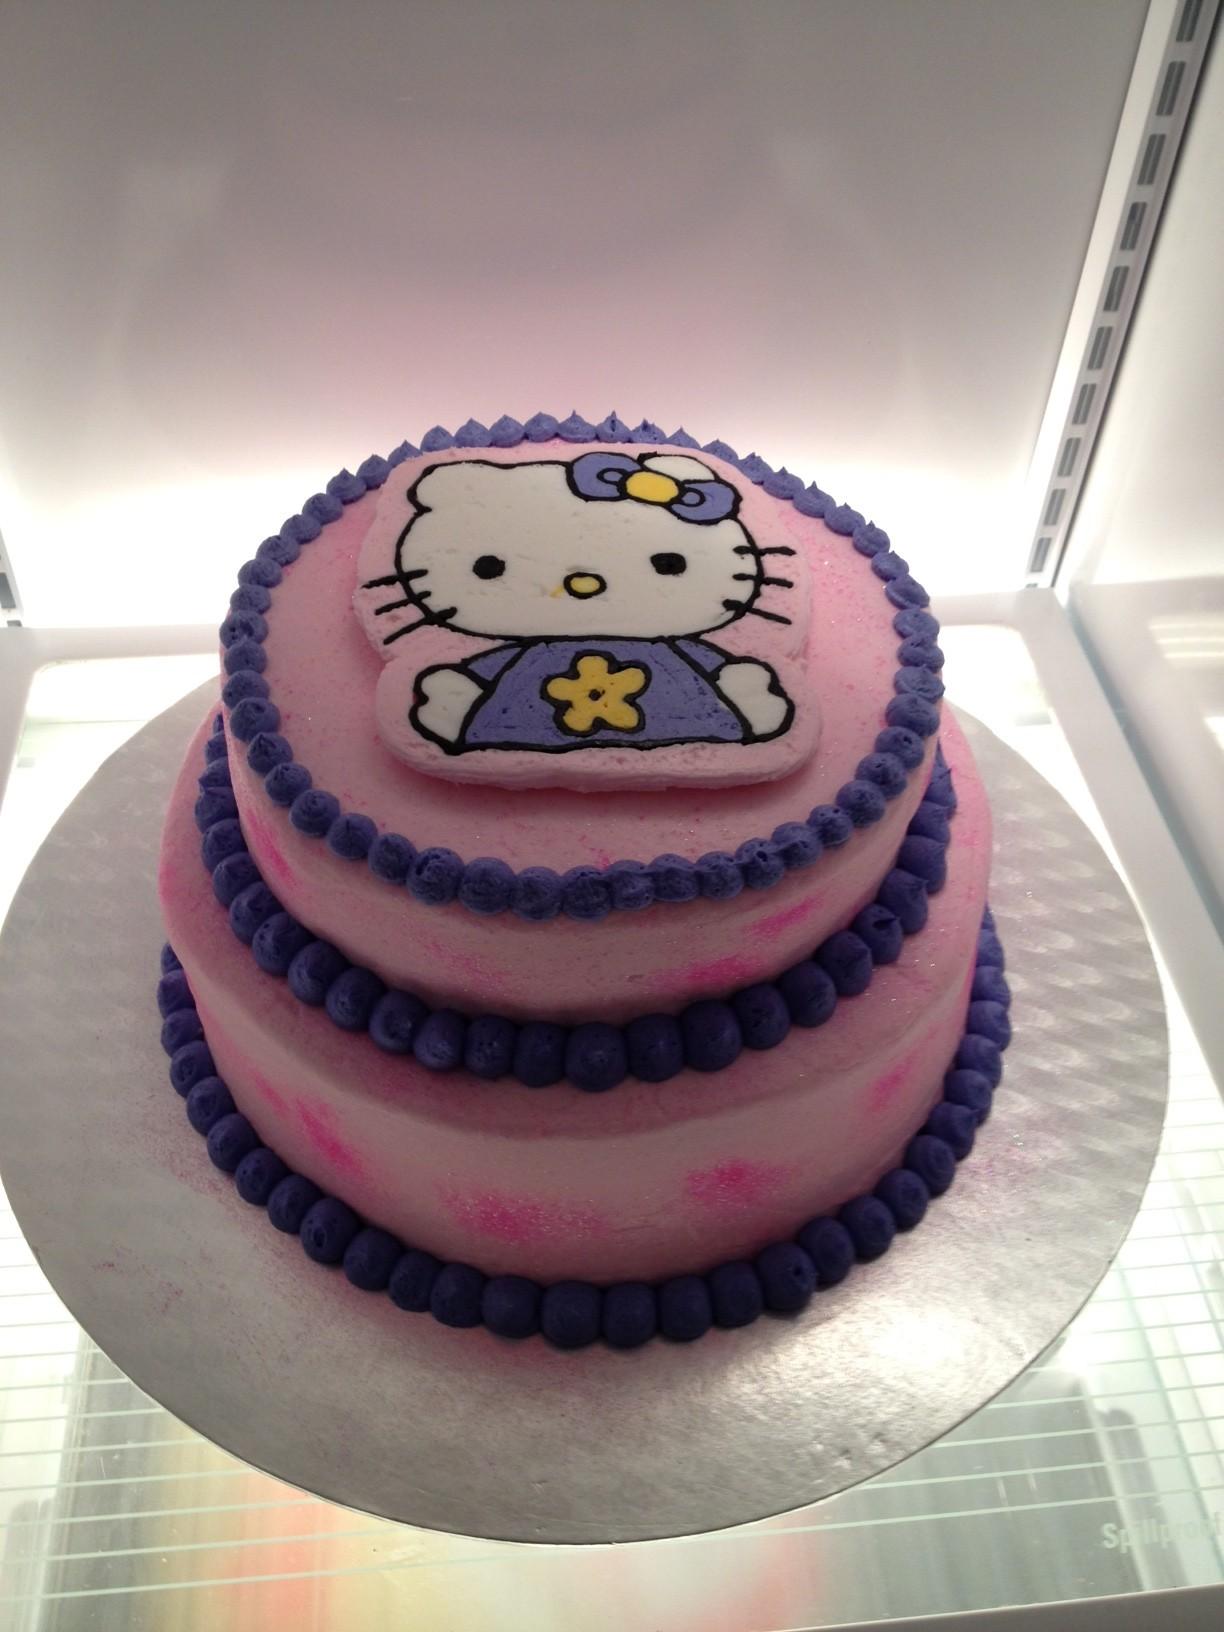 Estate Planning Is Like Birthday Cake